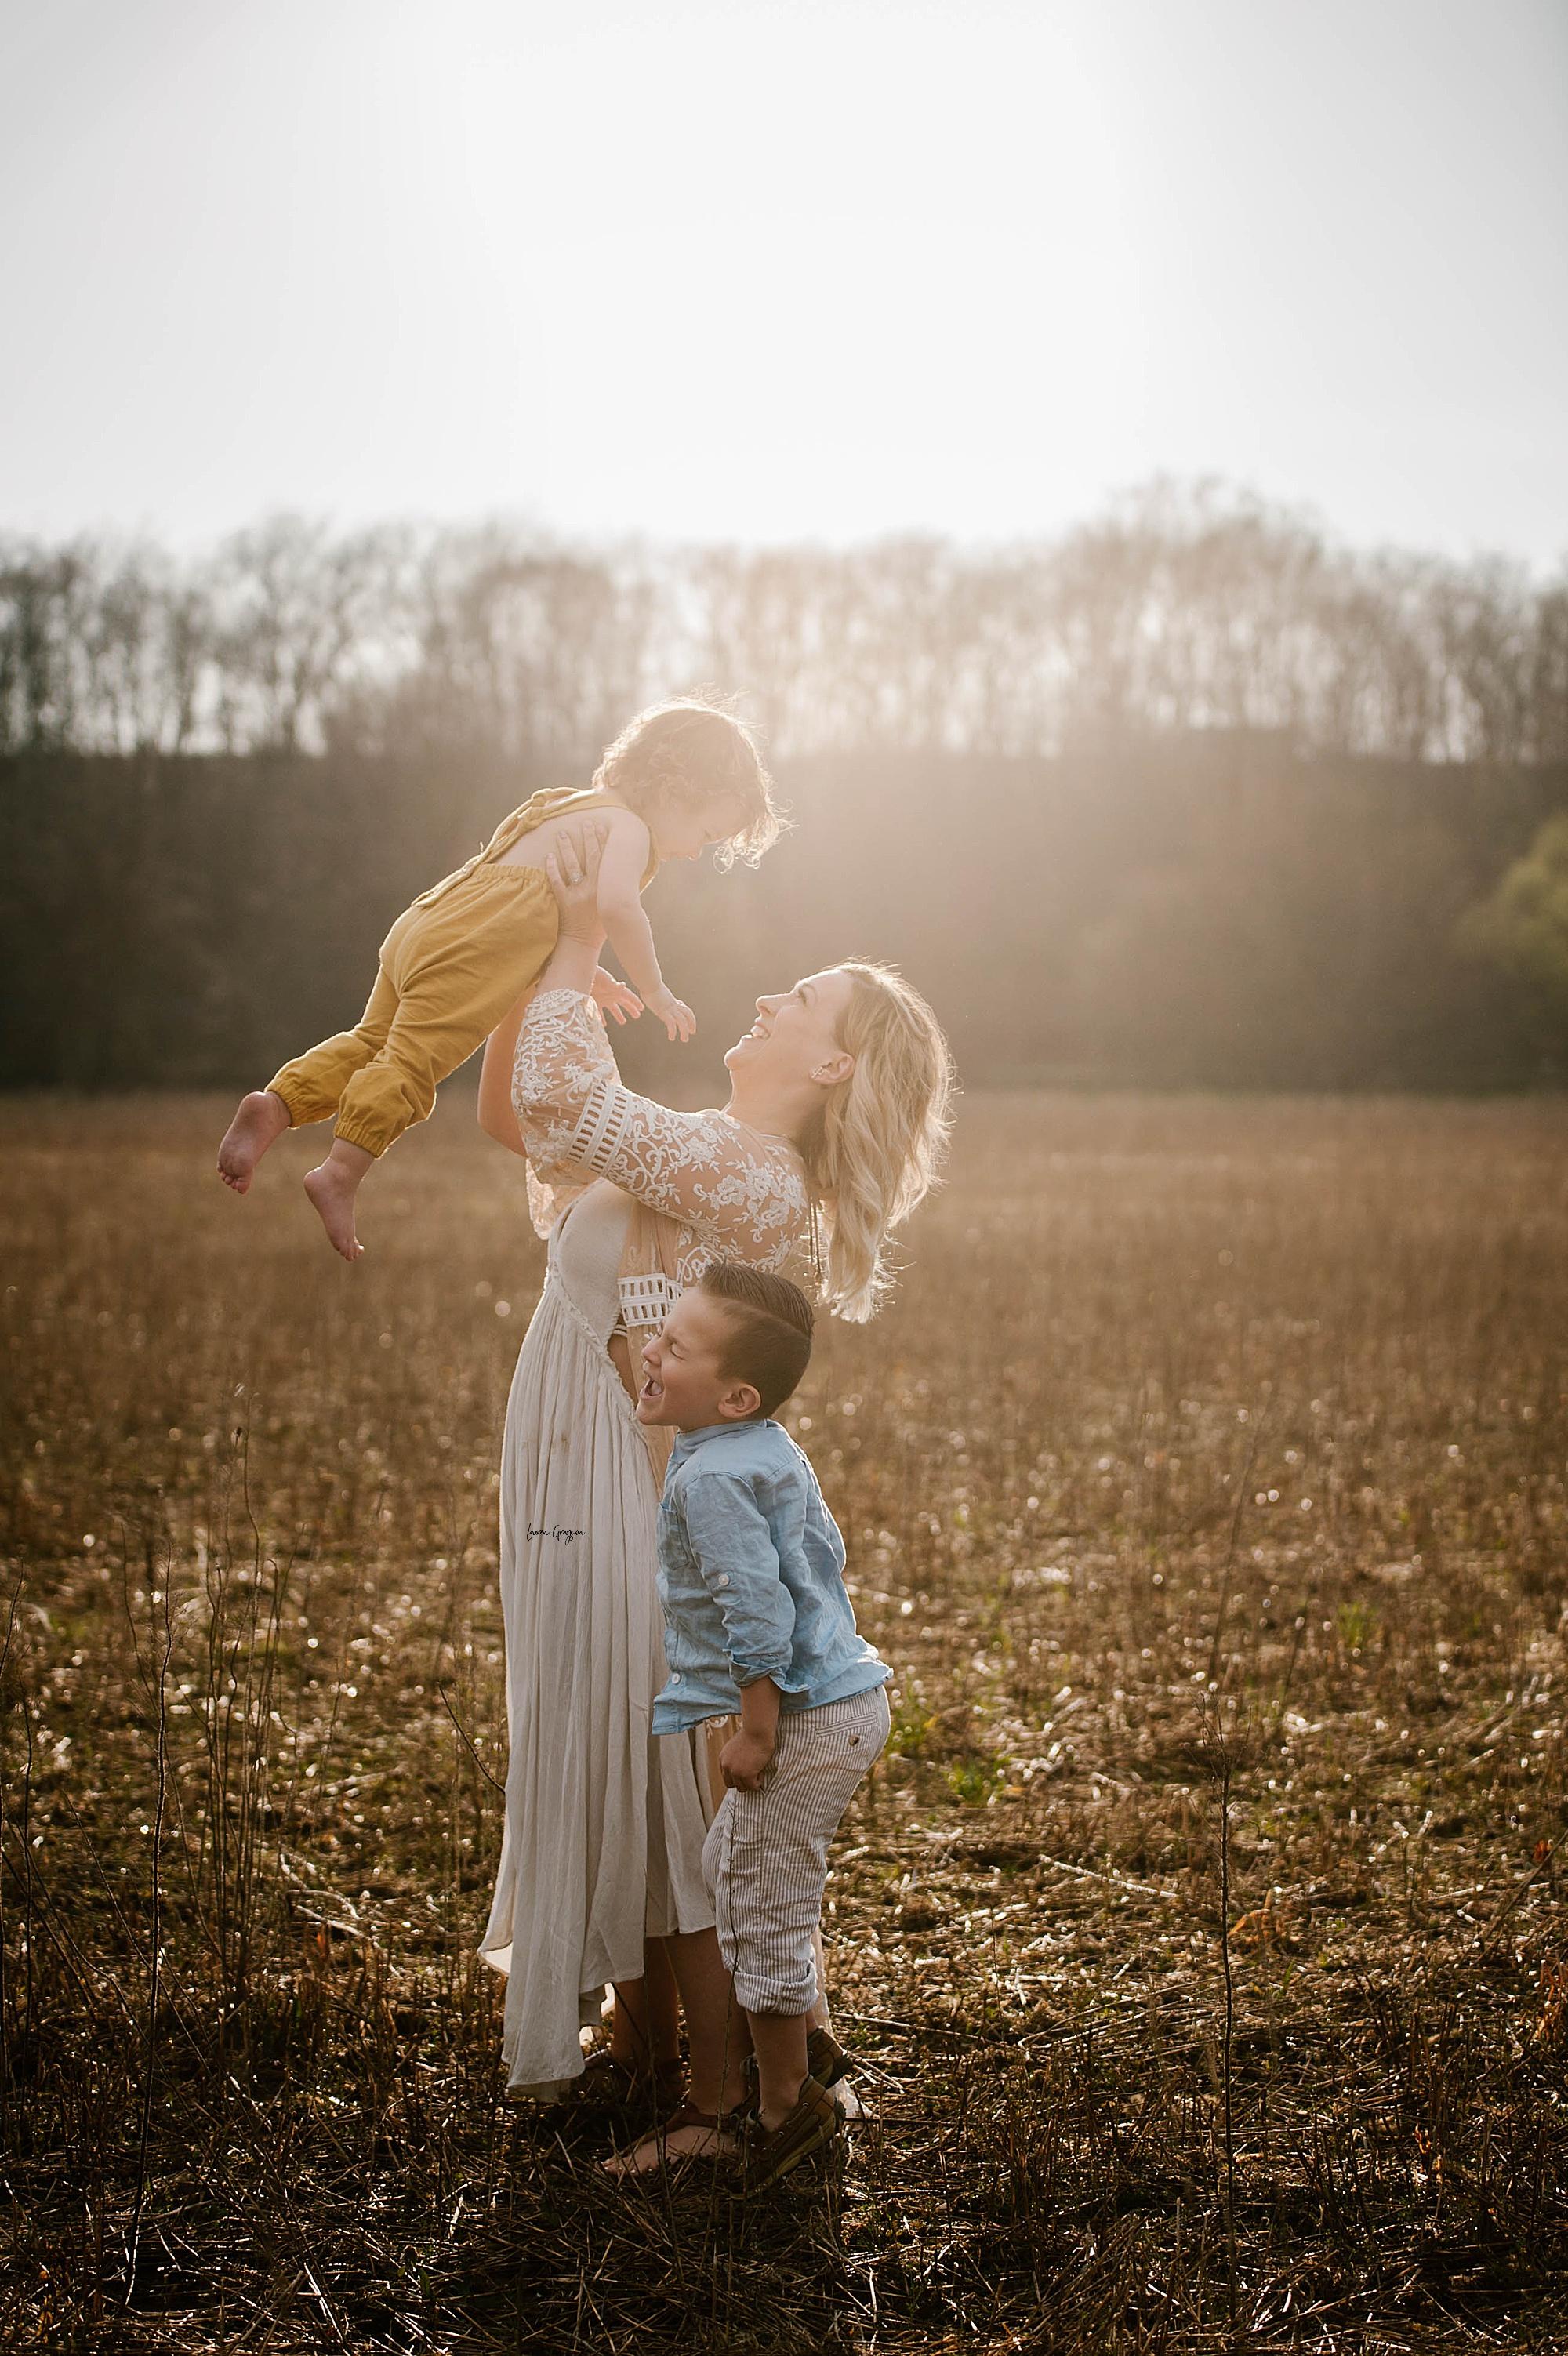 lauren-grayson-photography-akron-ohio-family-mom-boys-field-spring-outdoor-session_0016.jpg